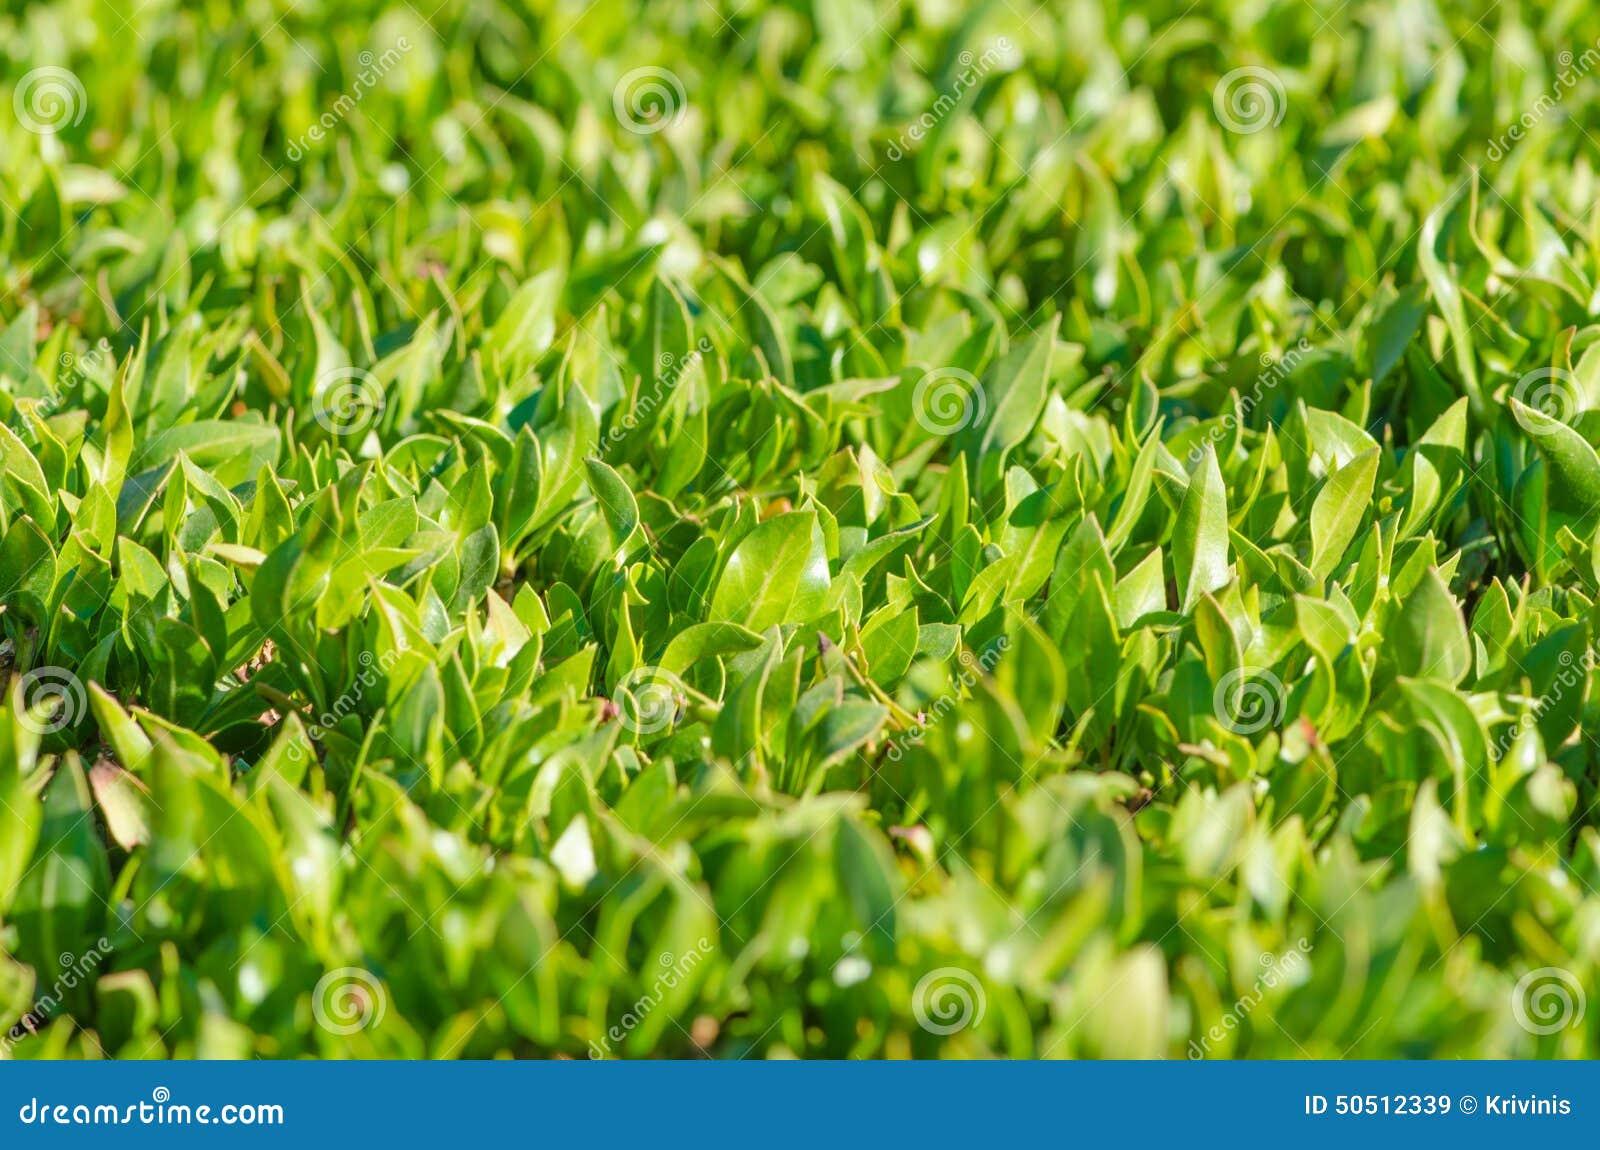 Grüner Zaun stockbild Bild von wand boden blume beschaffenheit